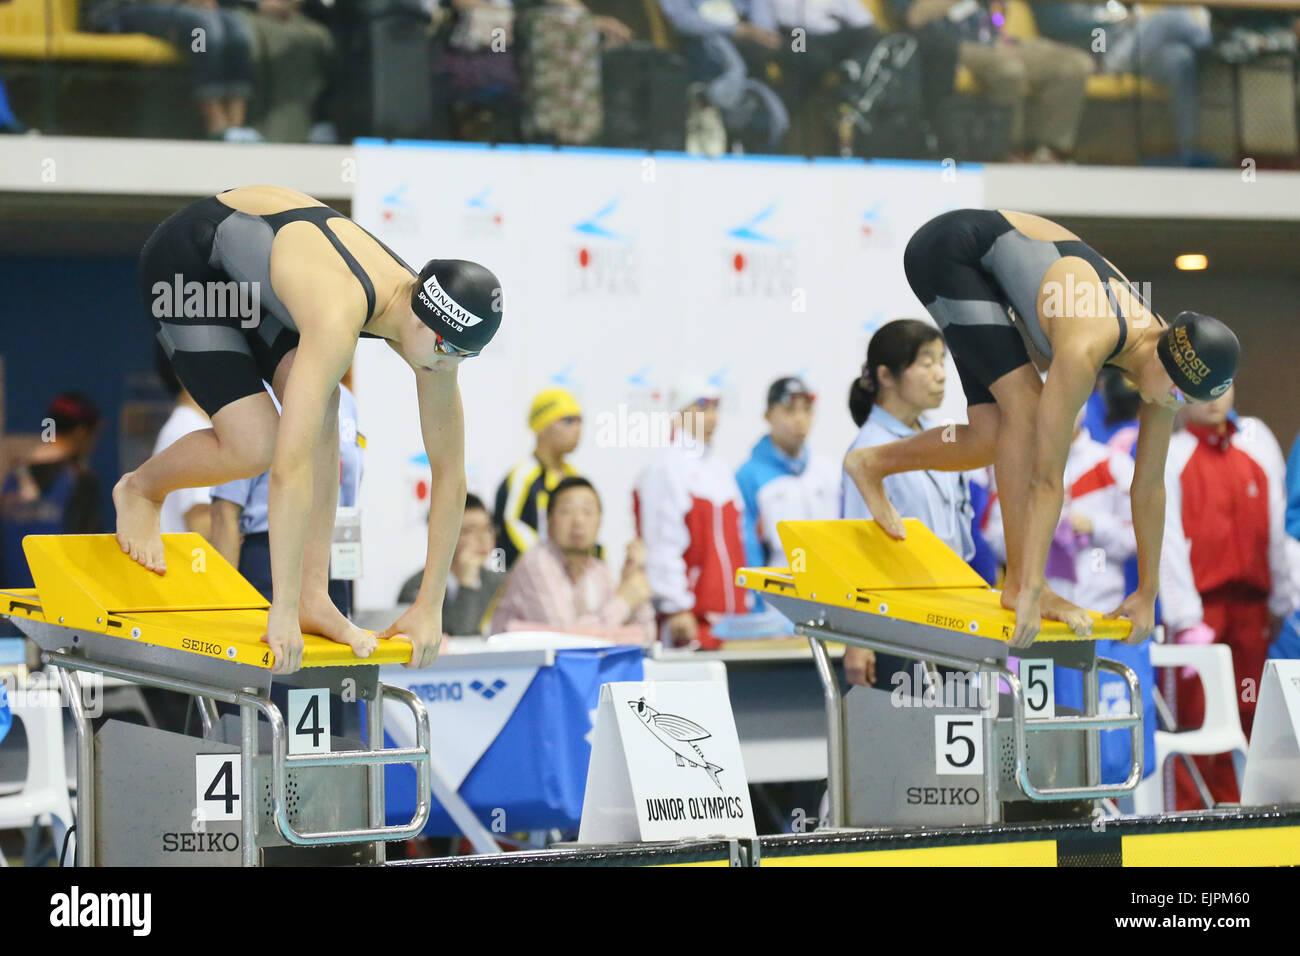 tatsumi international swimming pool tokyo japan 30th mar 2015 l to r yukino miyasaka runa imai march 30 2015 swimming the 37th joc junior